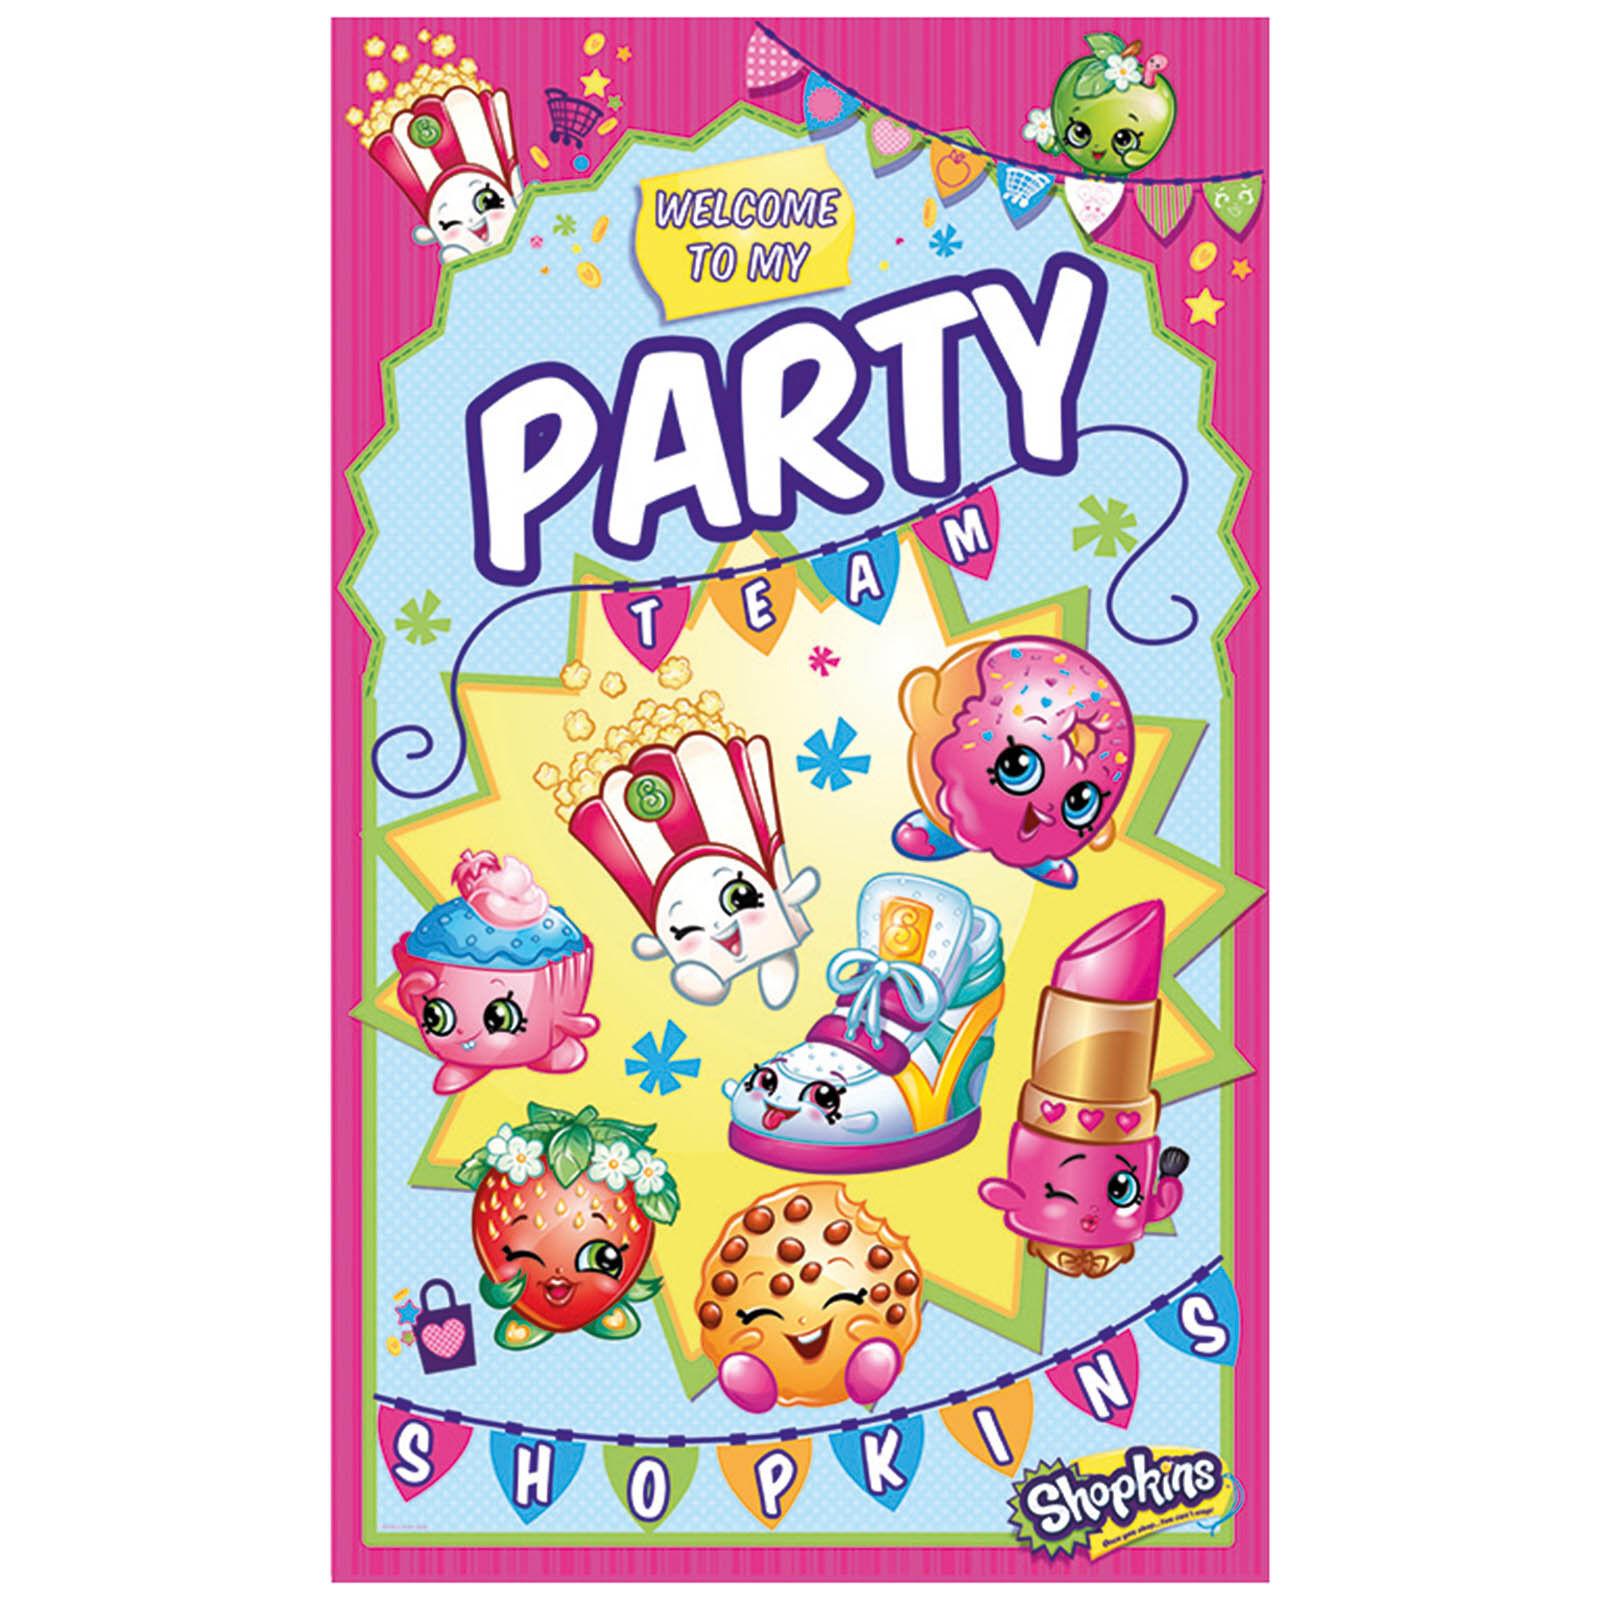 Shopkins Birthday Banner Shopkins Party Banner: Shopkins Toys Children's Birthday Party Door Poster Banner